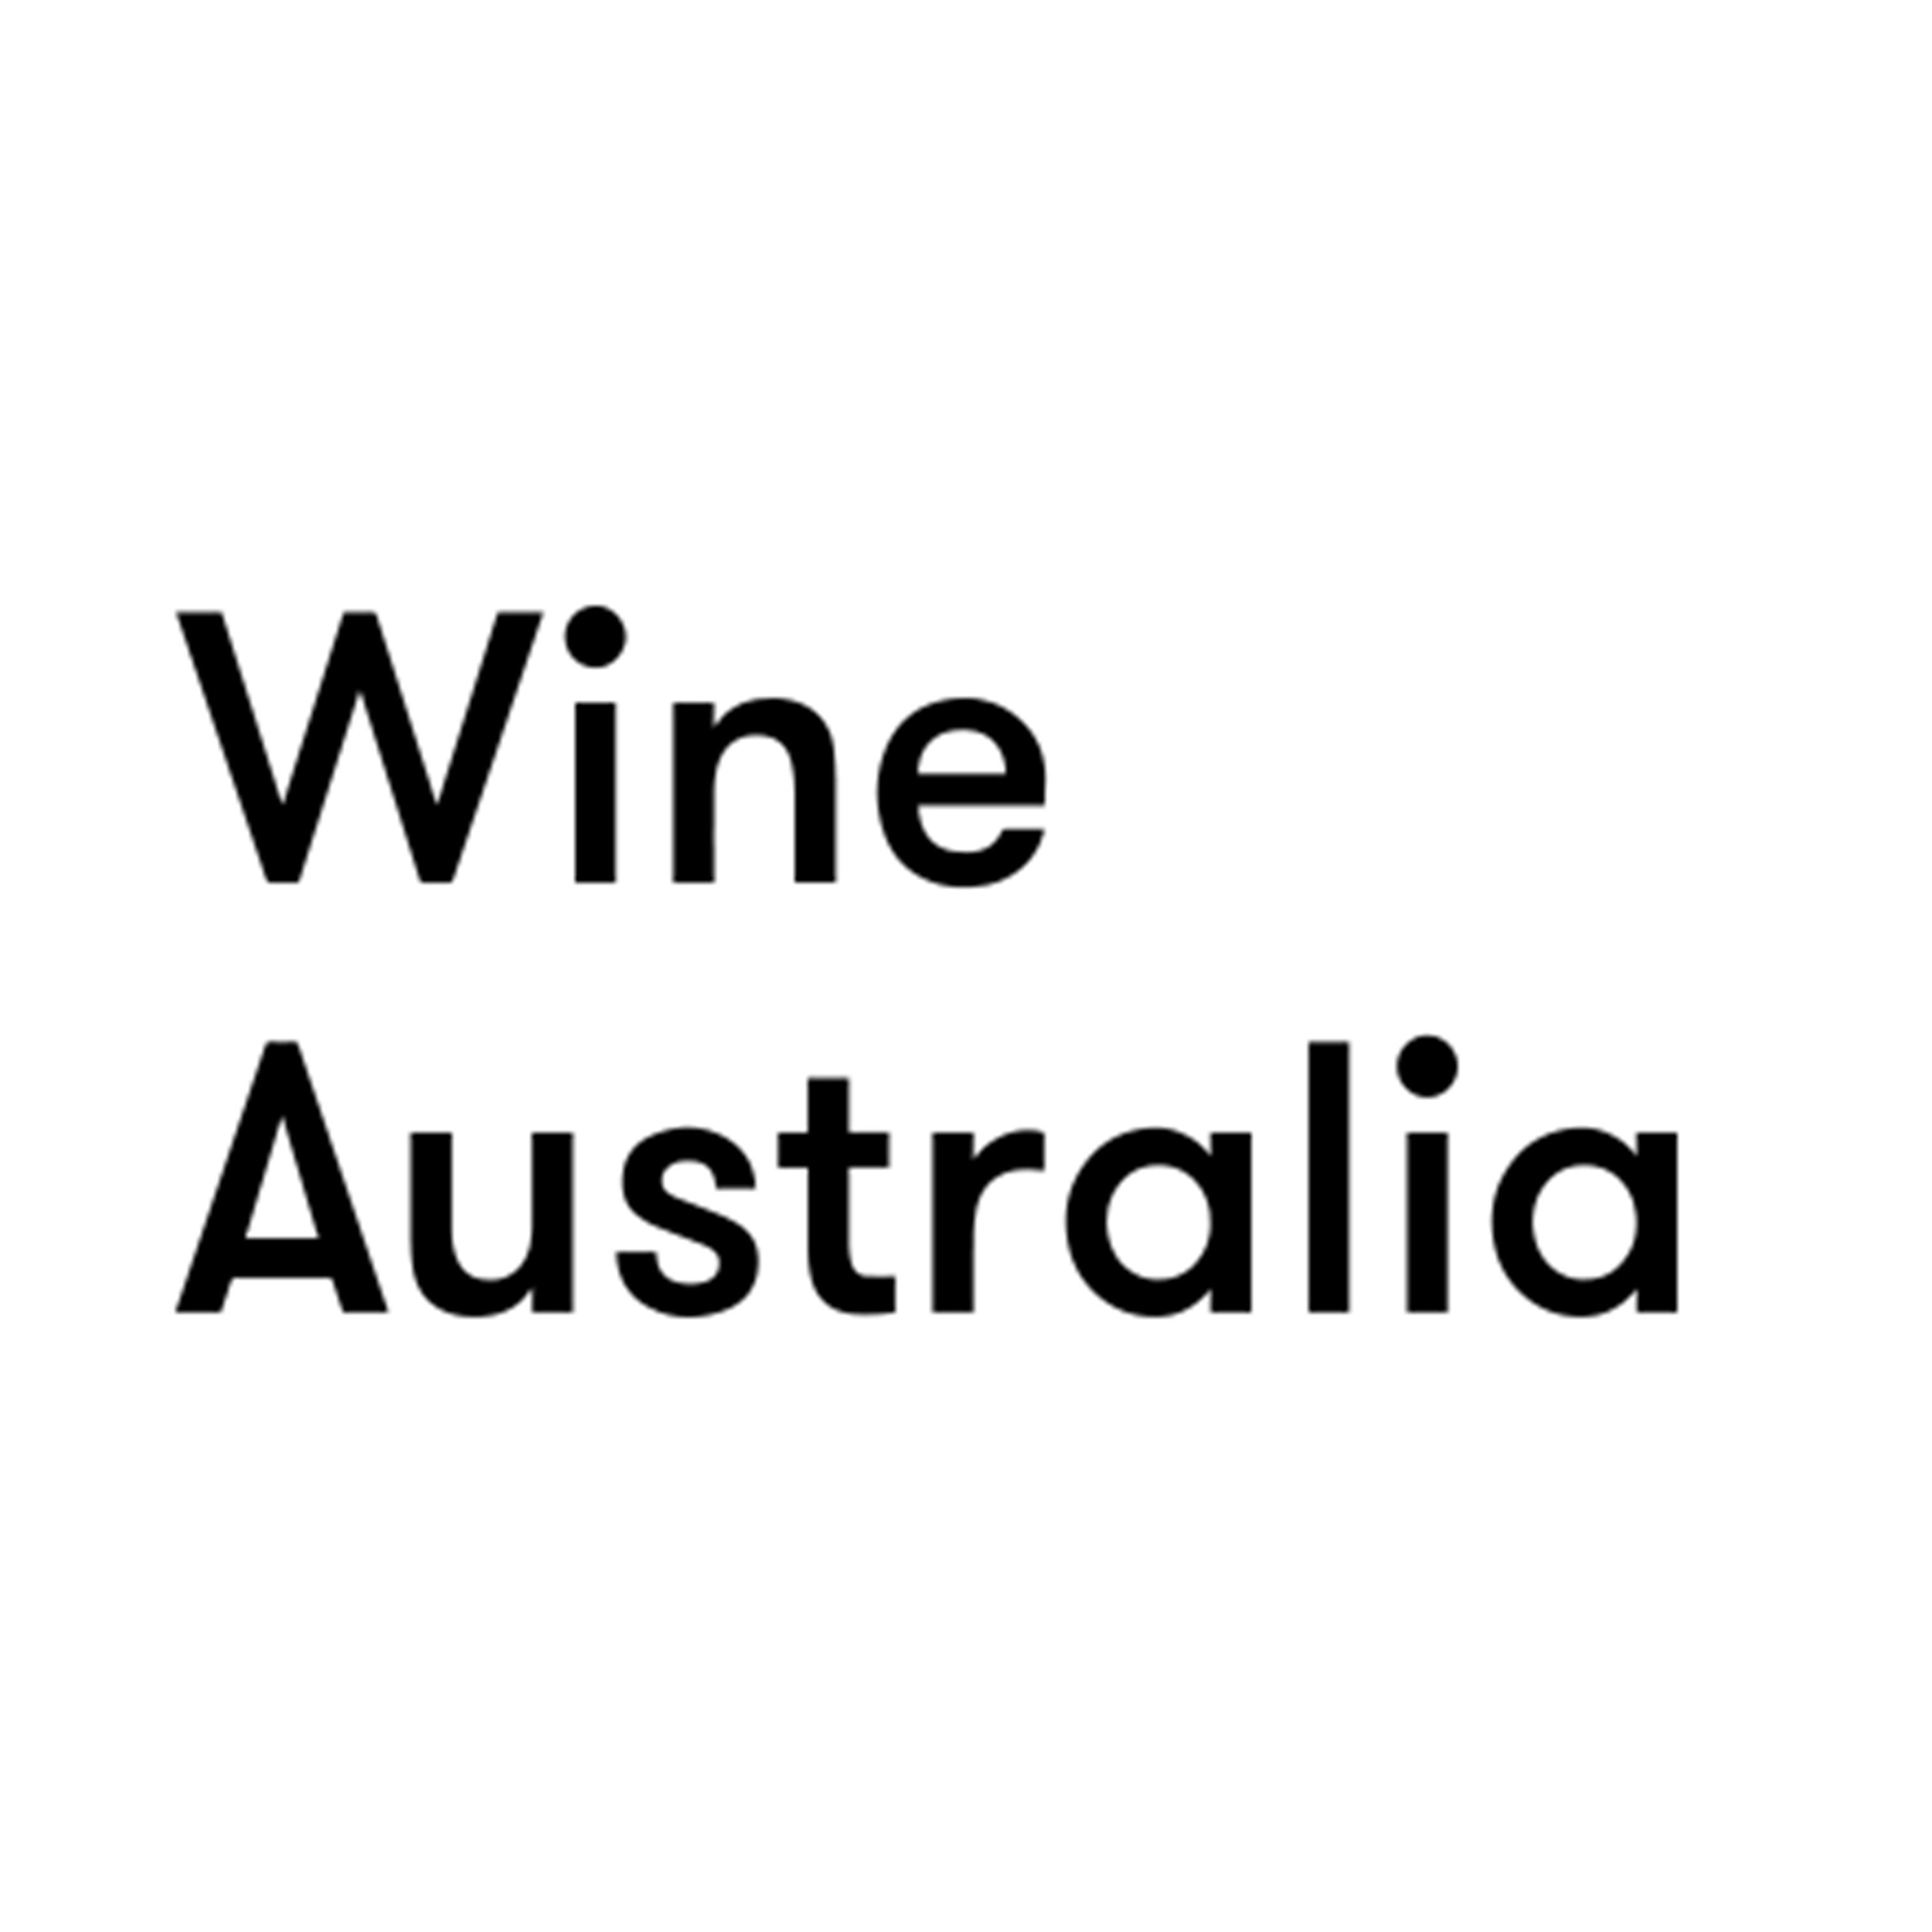 Wine Australia - Who we work with